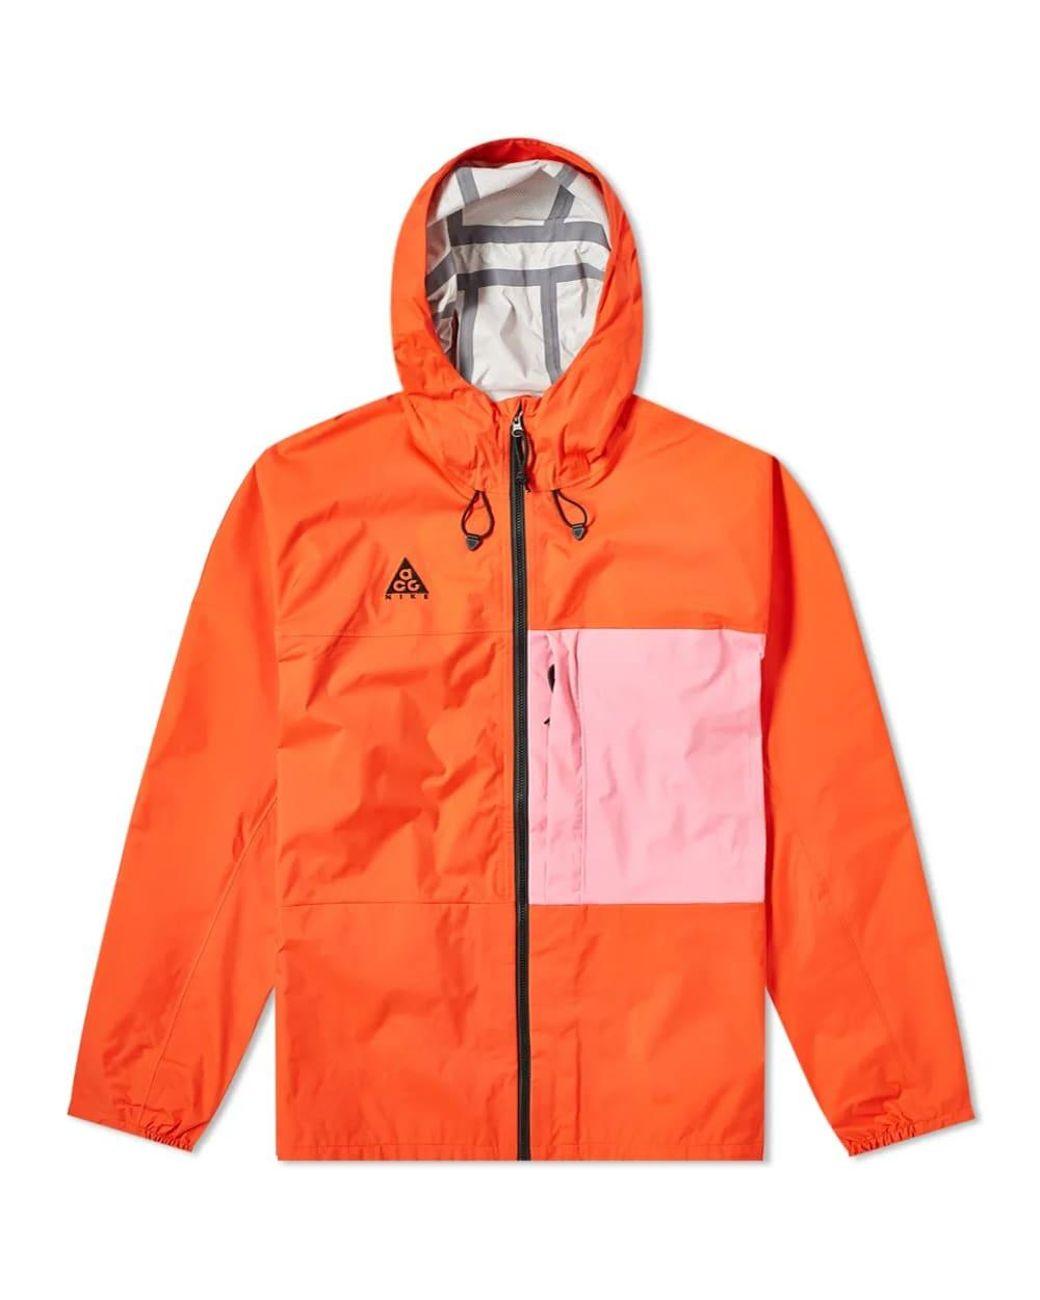 0f4cfb892 Nike Acg 2.5l Packable Jacket in Orange for Men - Lyst